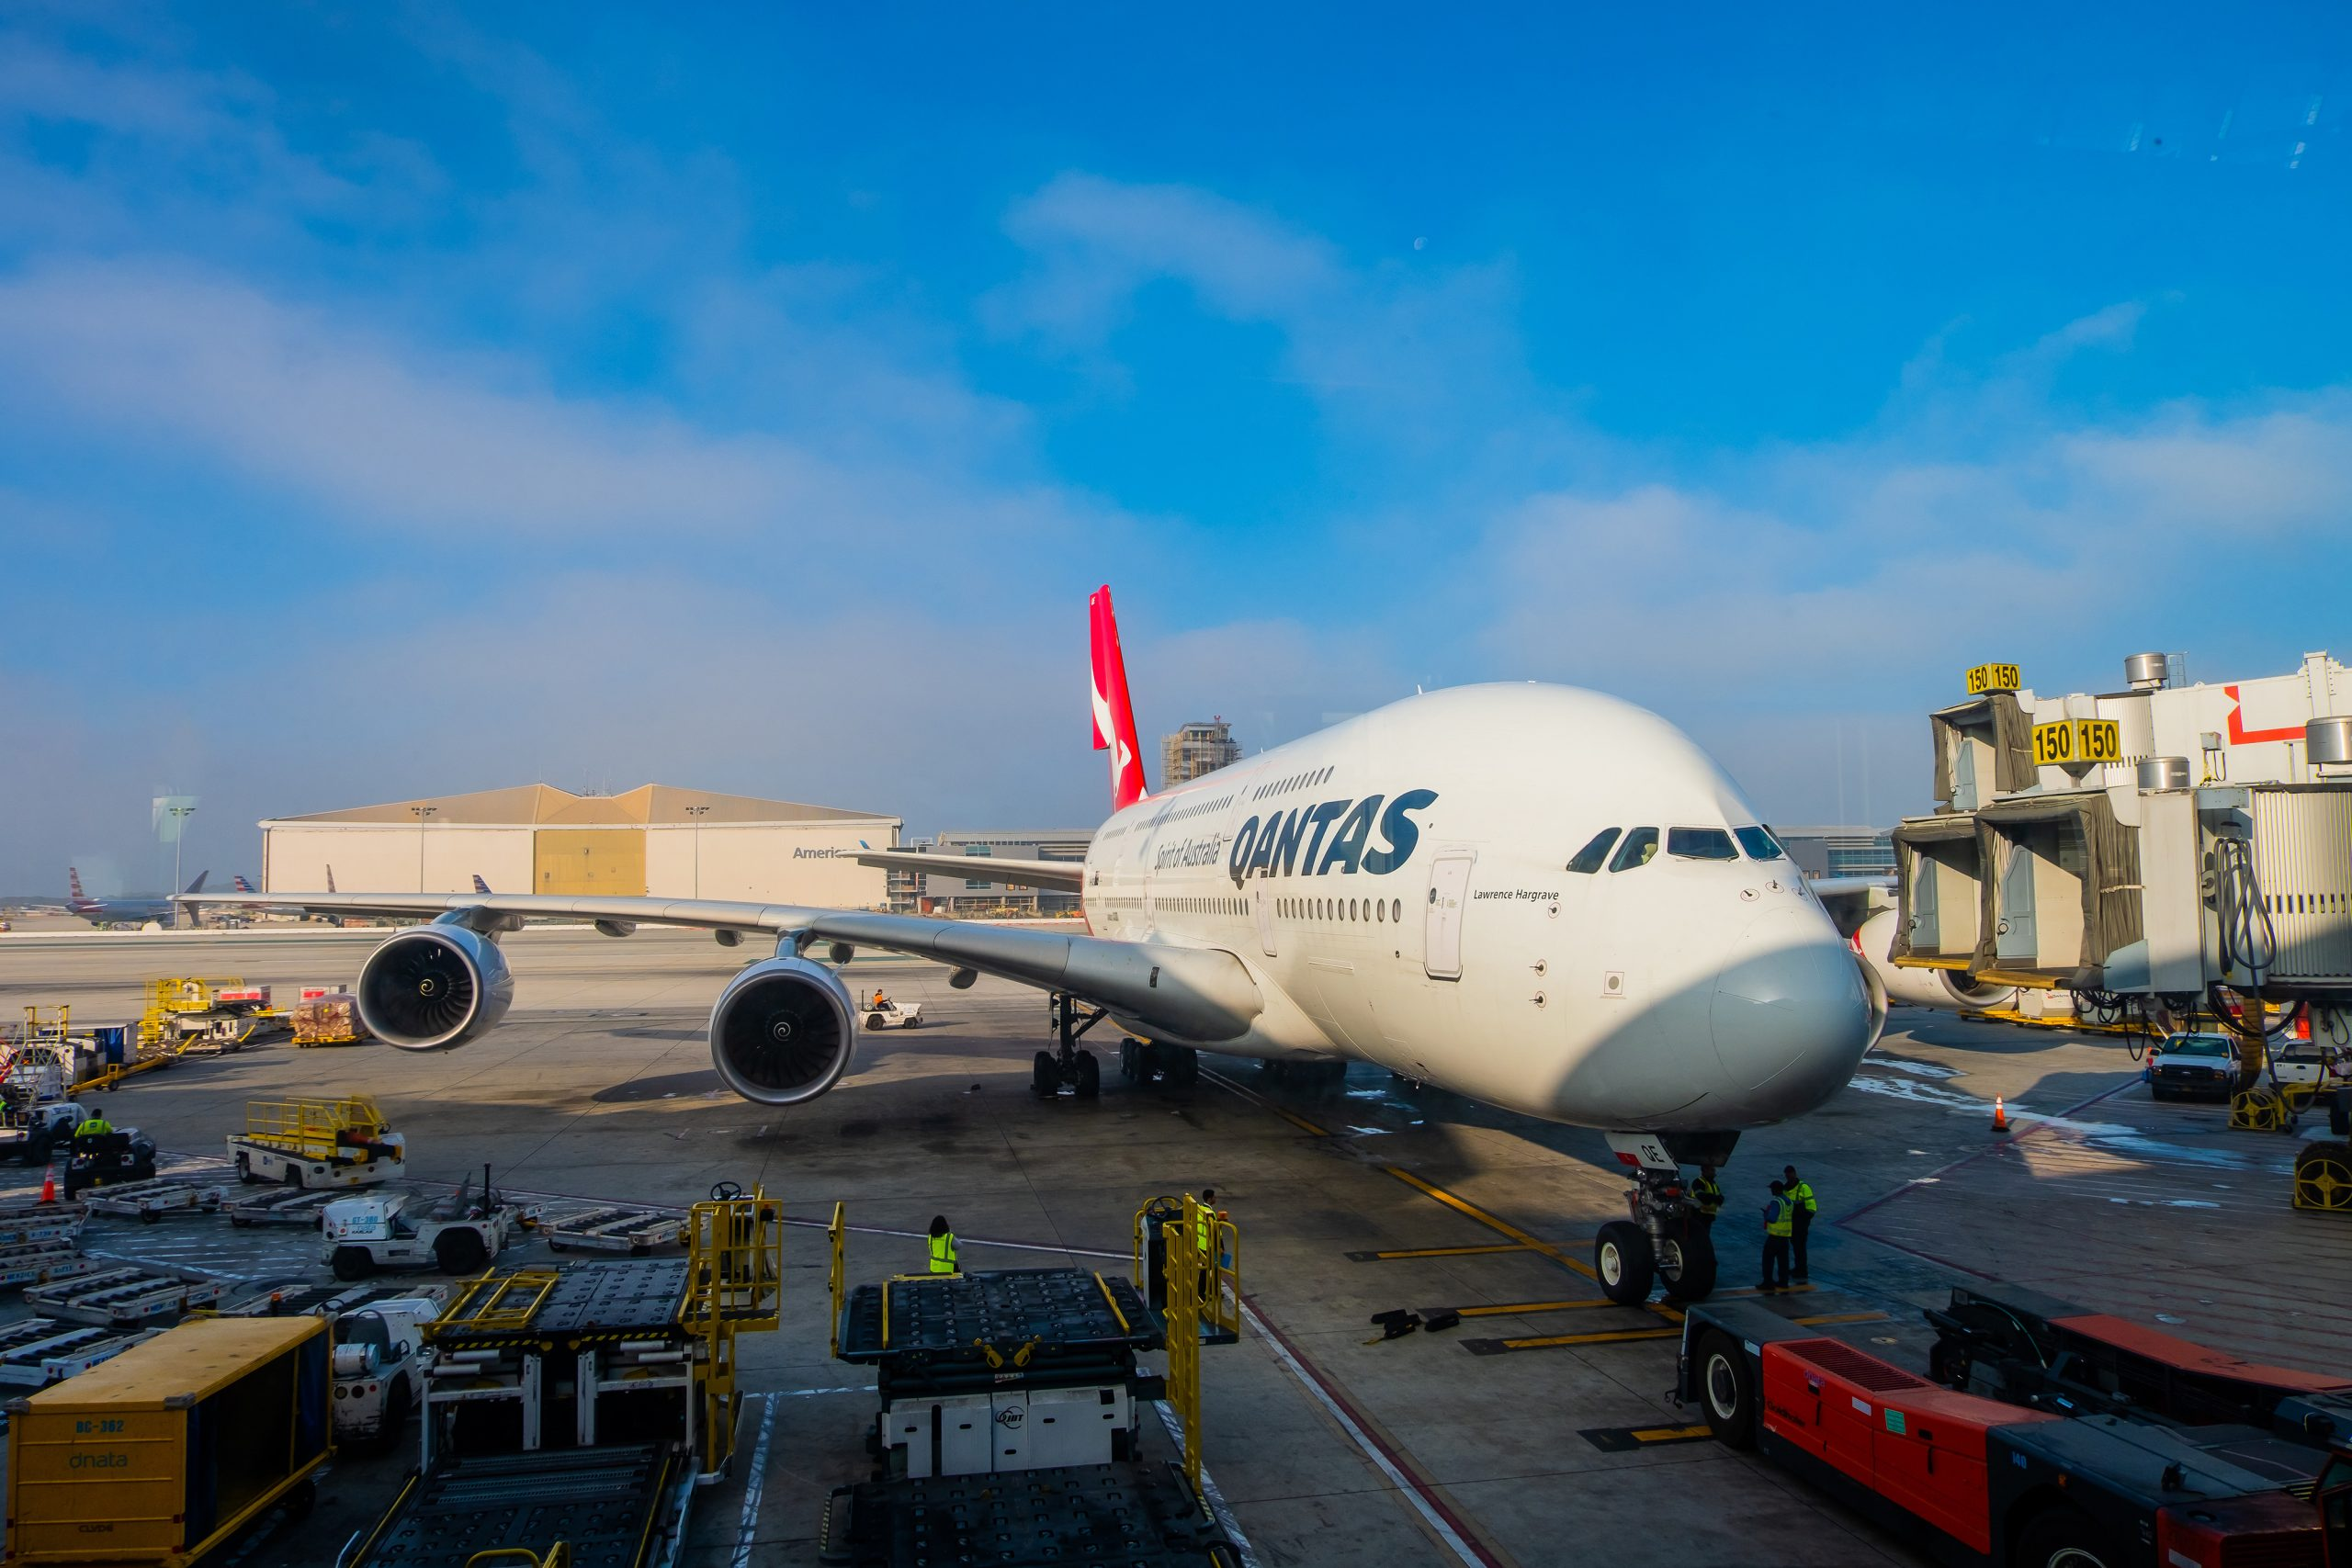 Airbus A380 fra Qantas. (Foto: CK Foto | Shutterstock)